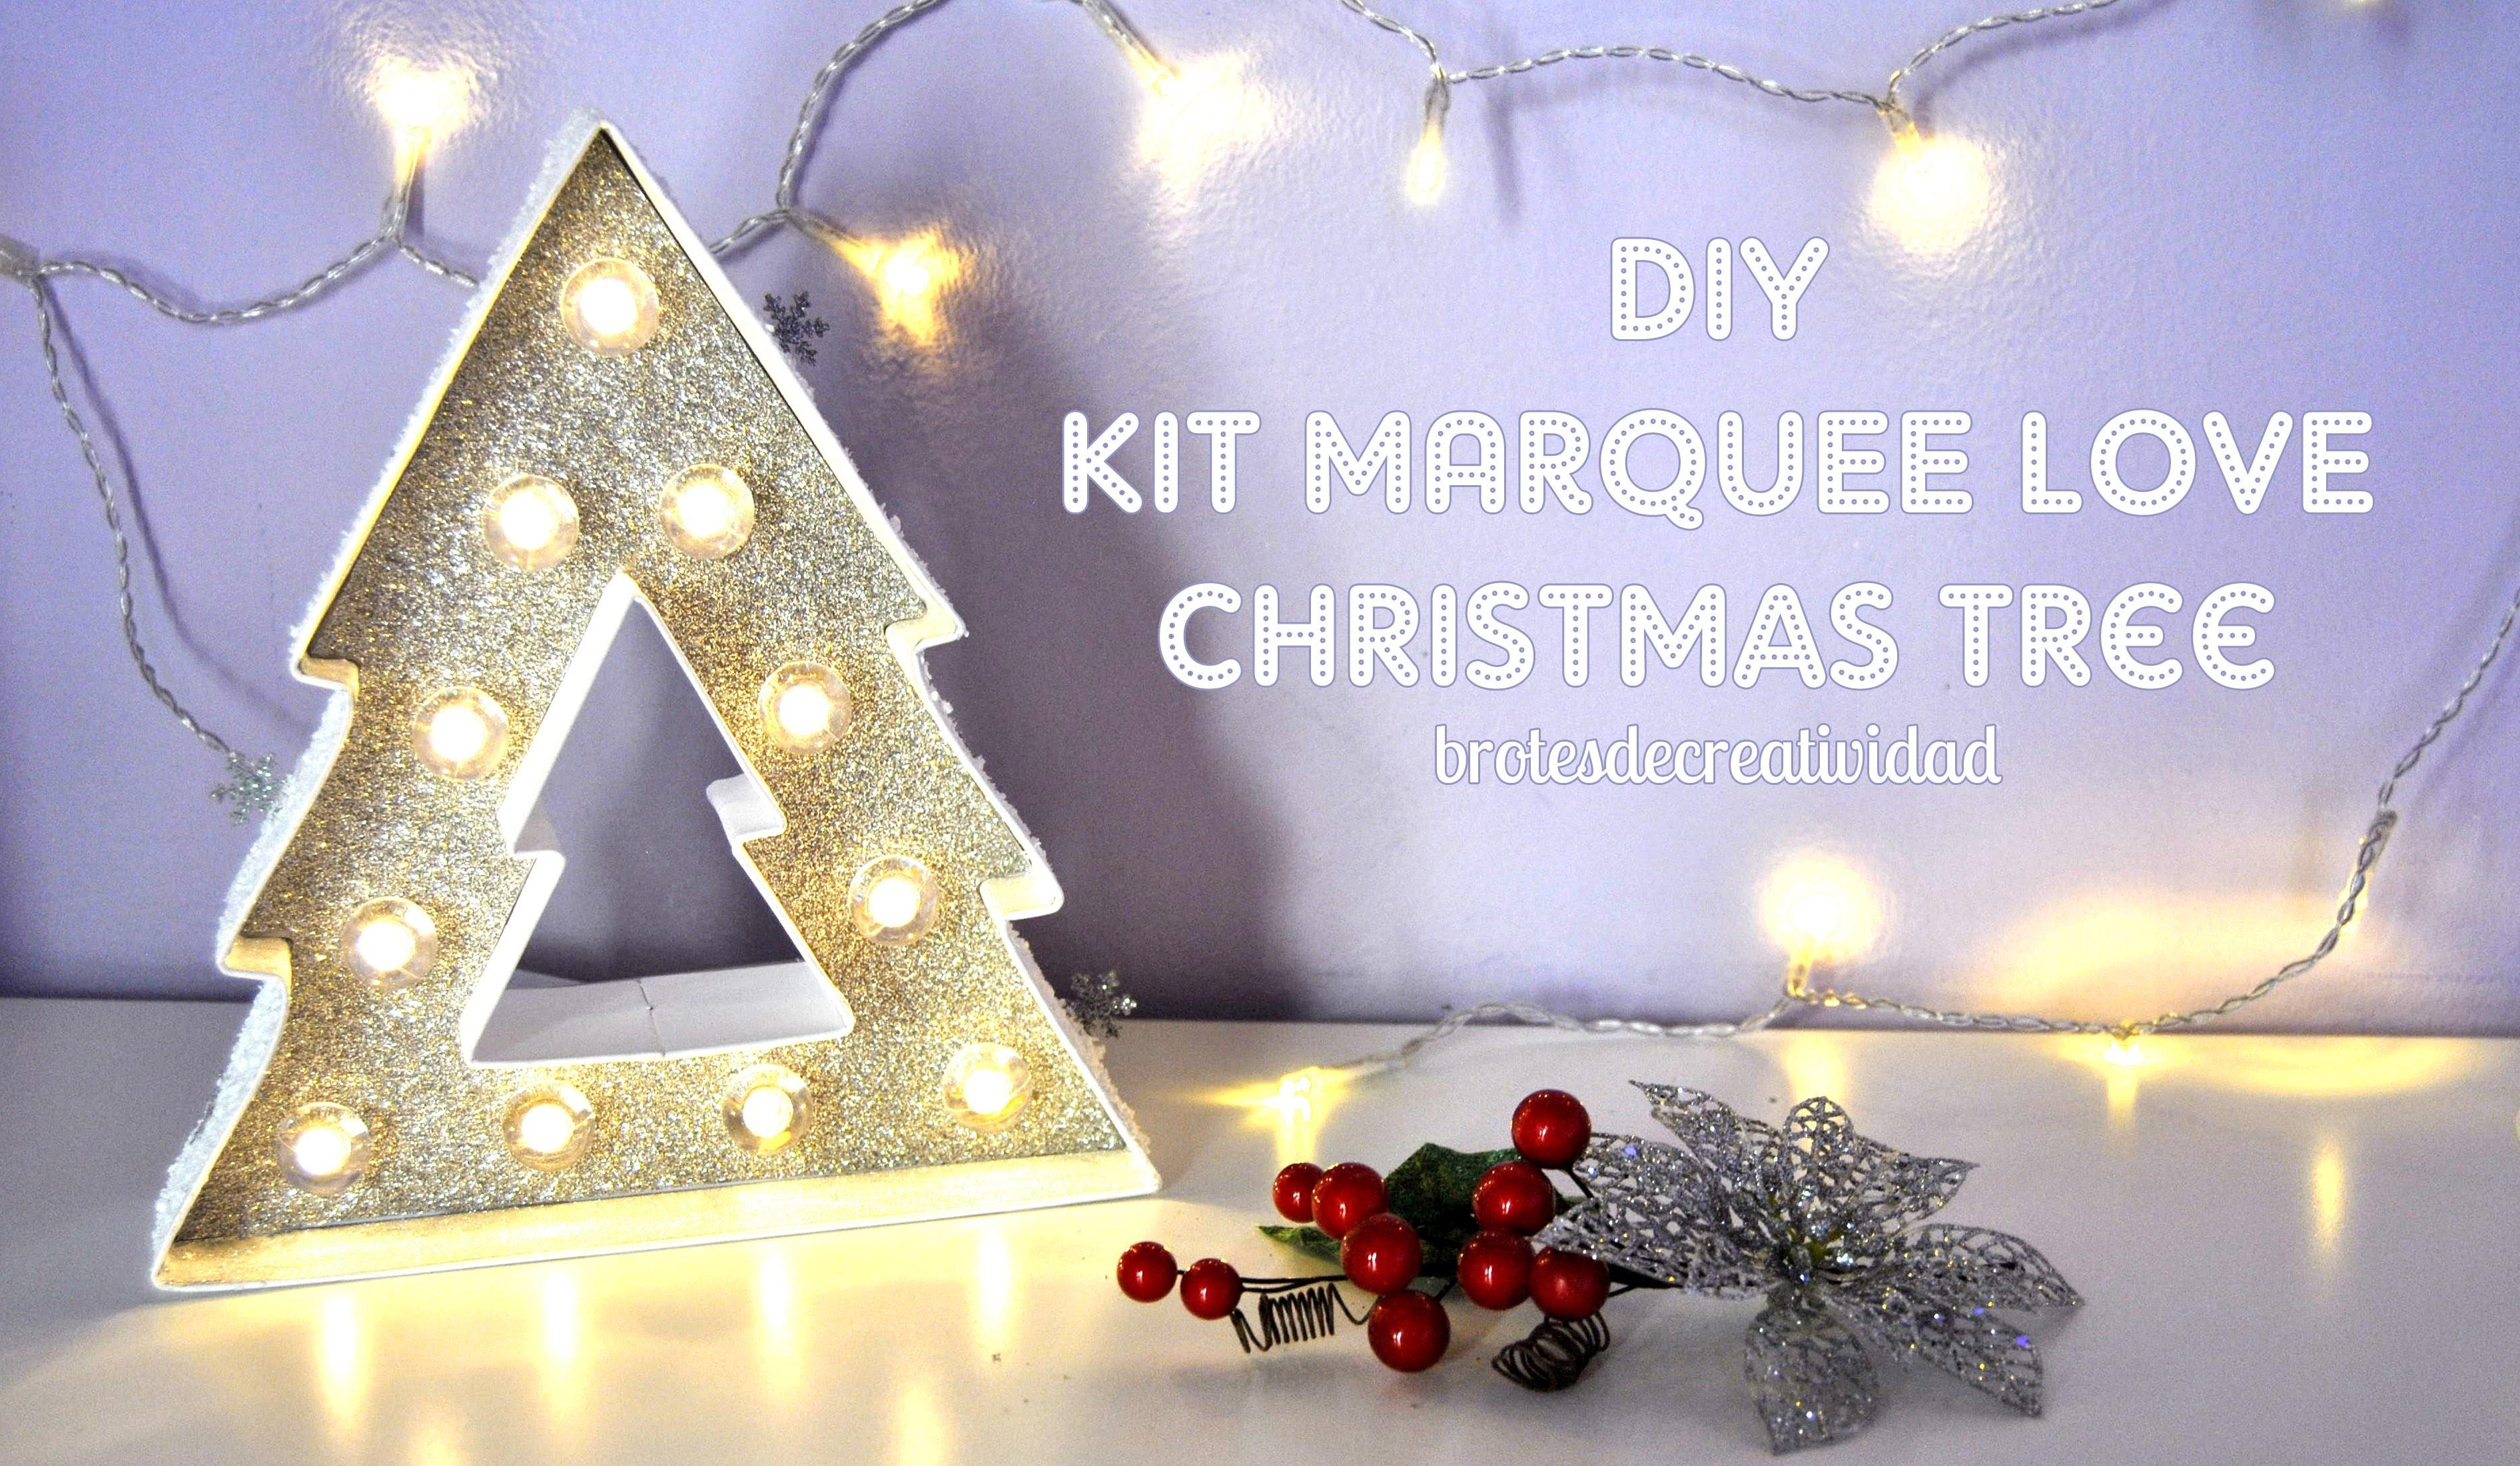 DIY : KIT Marquee Love Christmas Tree